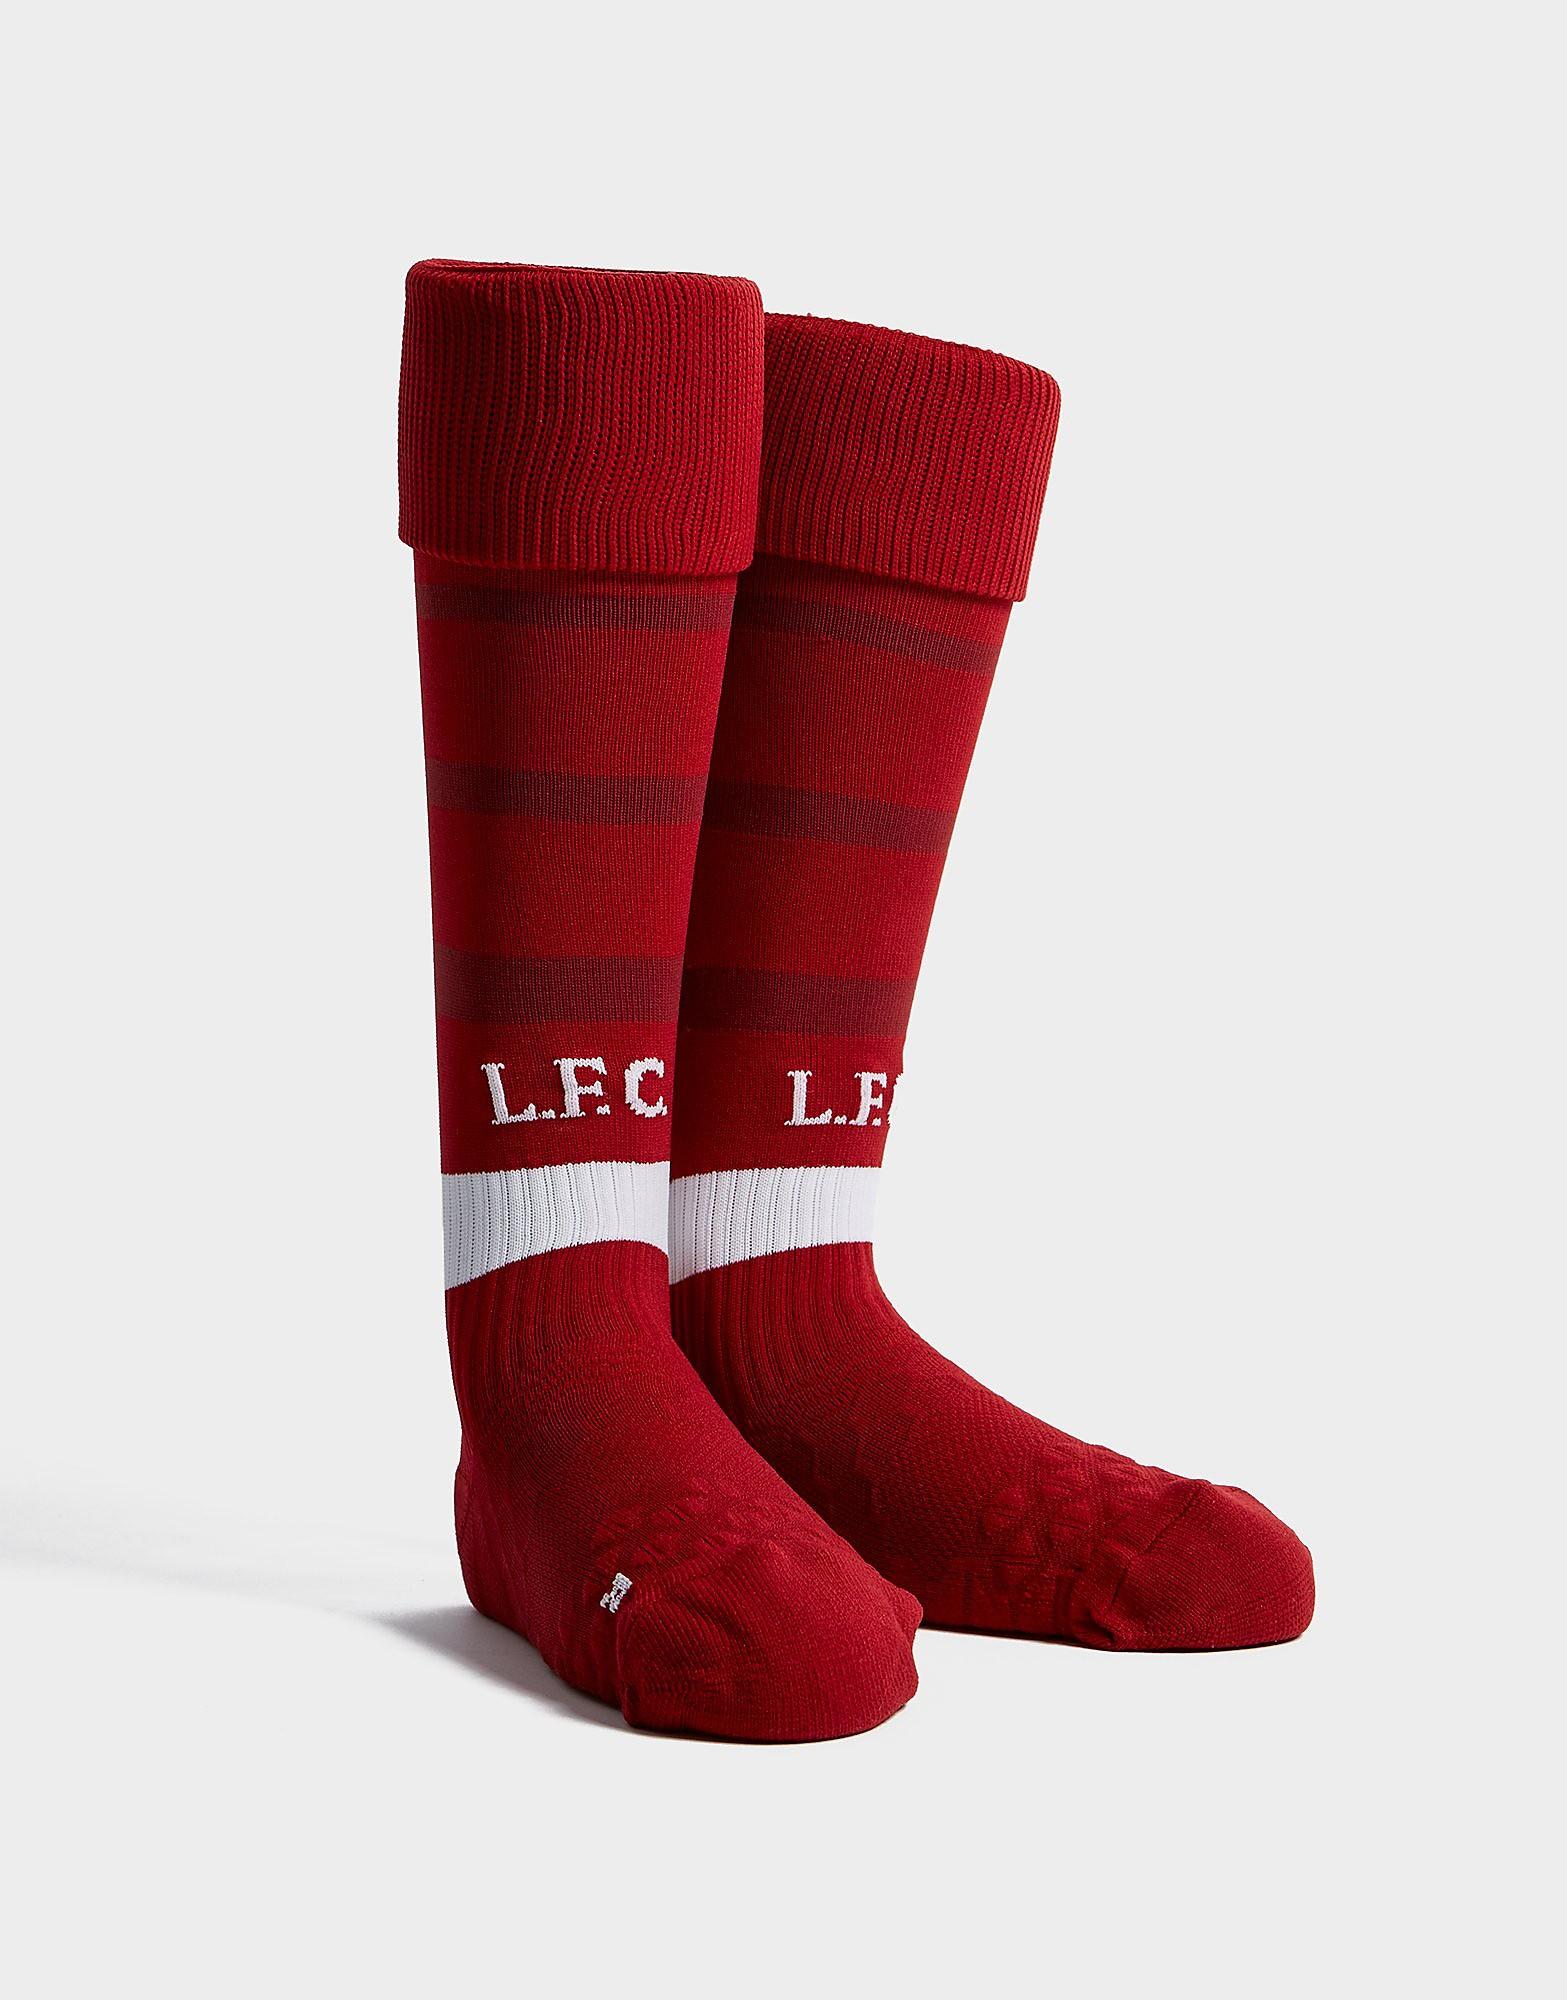 New Balance Liverpool FC 2018 Home Socks